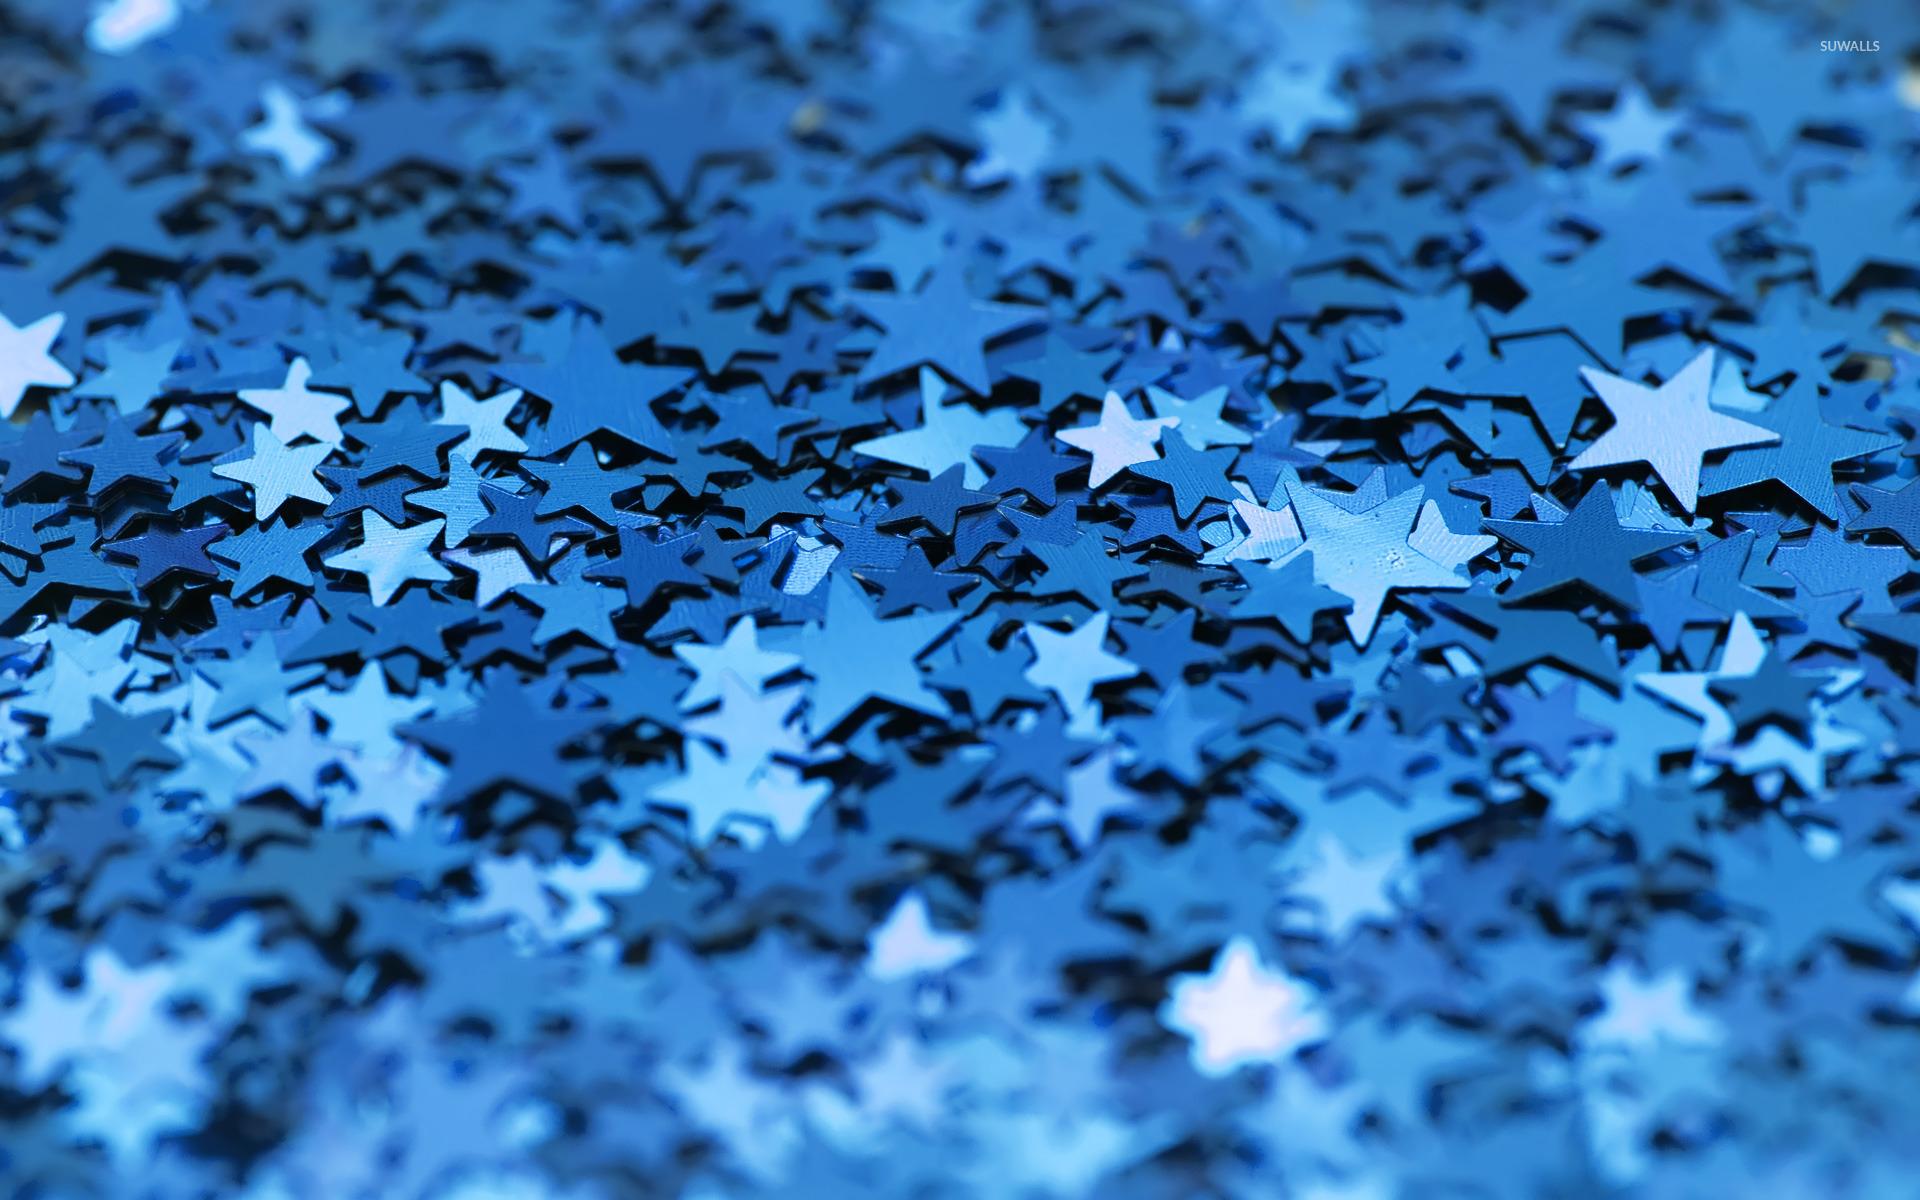 beach christmas photo ideas - Blue Stars Wallpaper WallpaperSafari